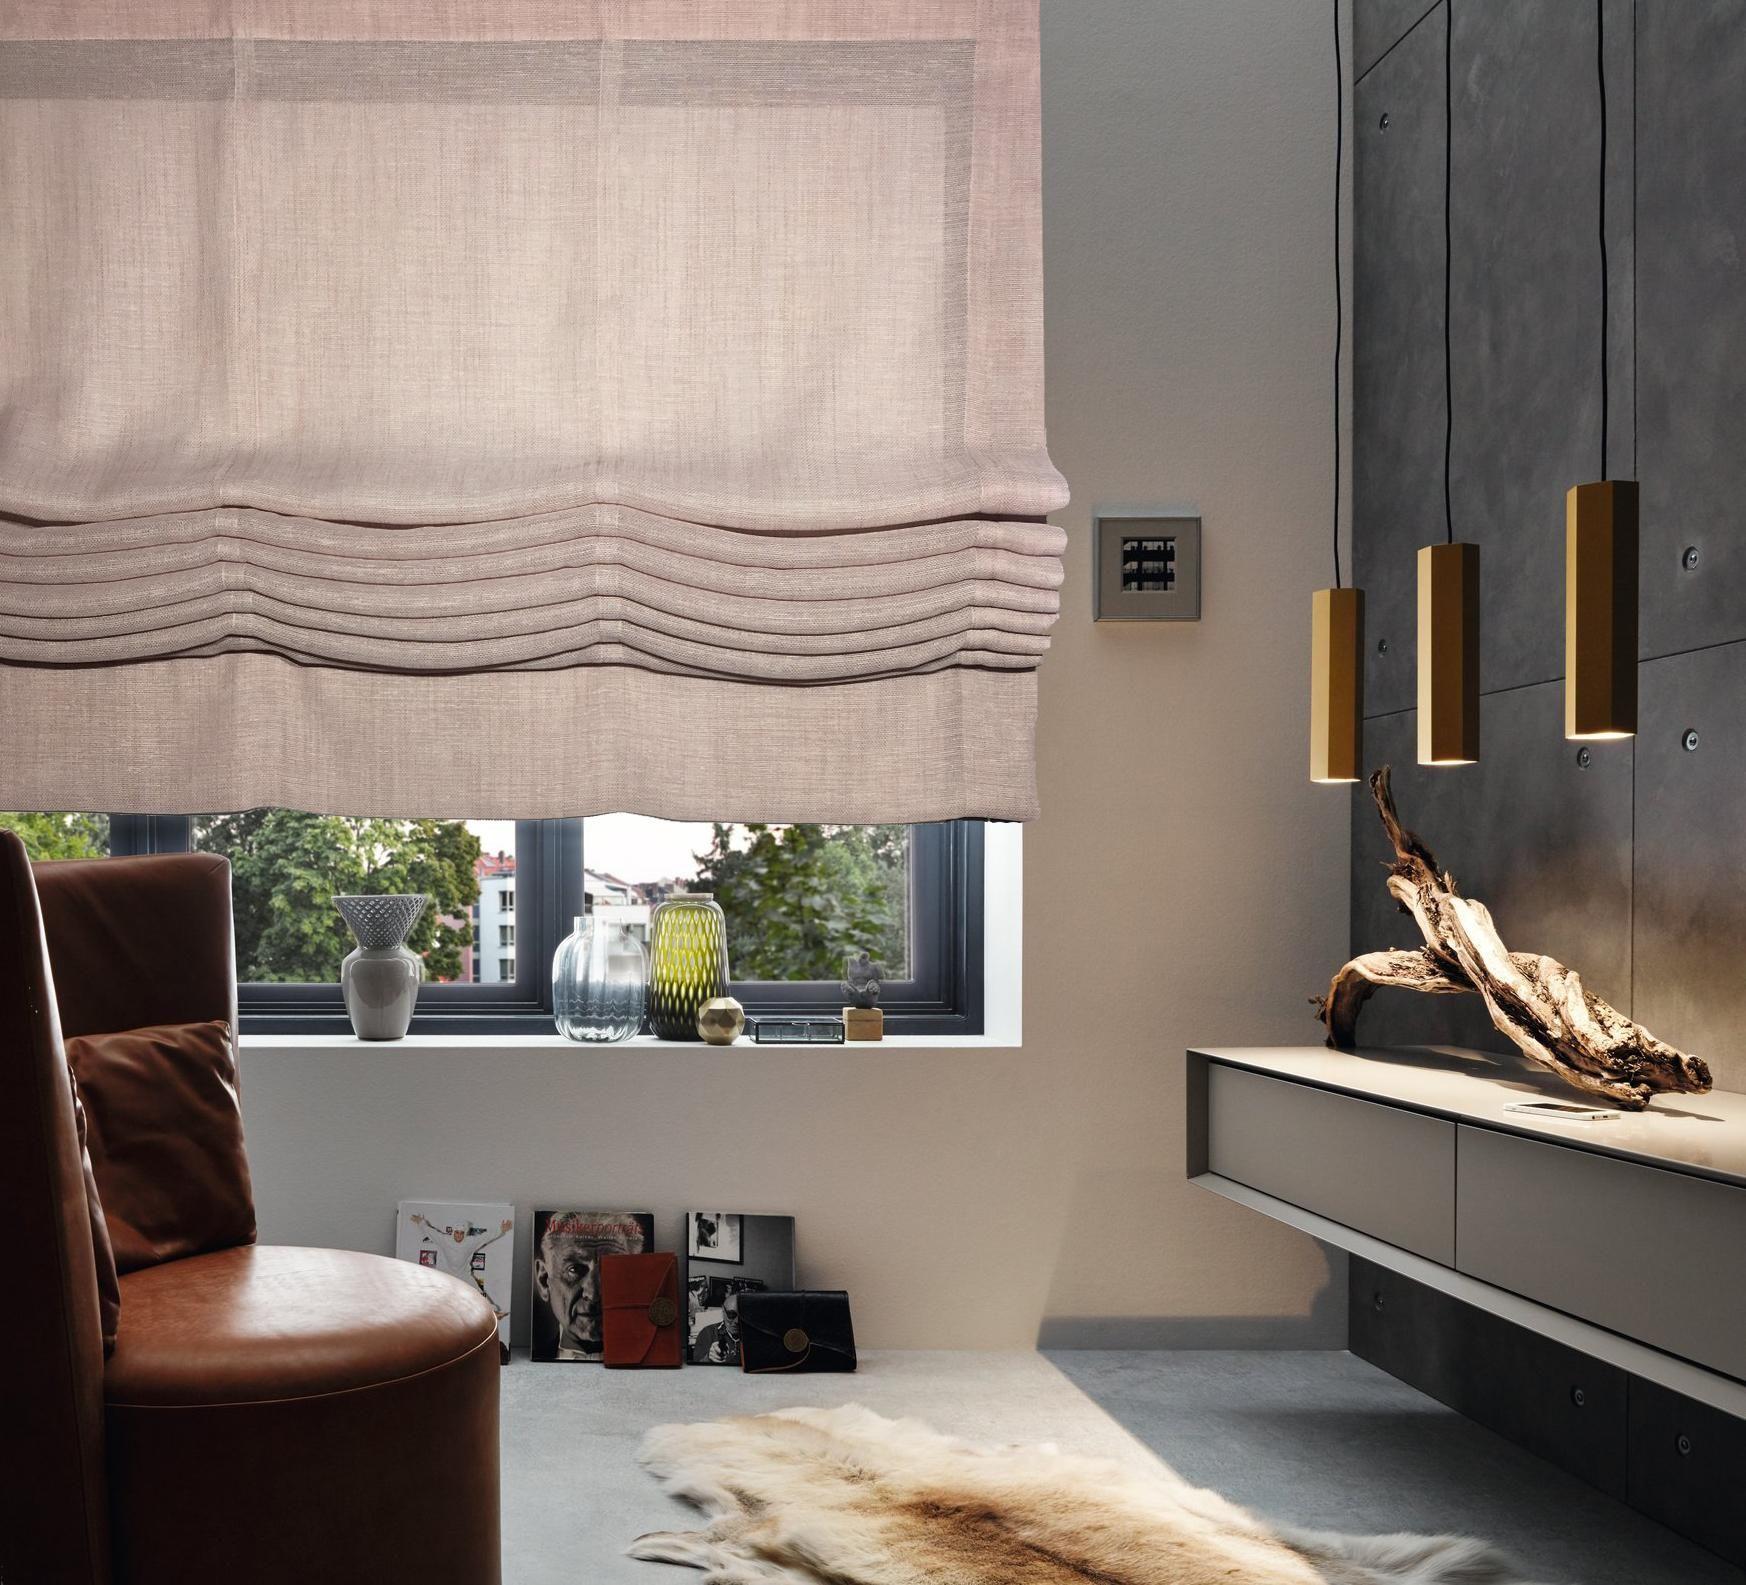 Design Faltrollo Style Pure I Ideen Fur Raume Wohnzimmer Ideen Haus Deko Faltrollo